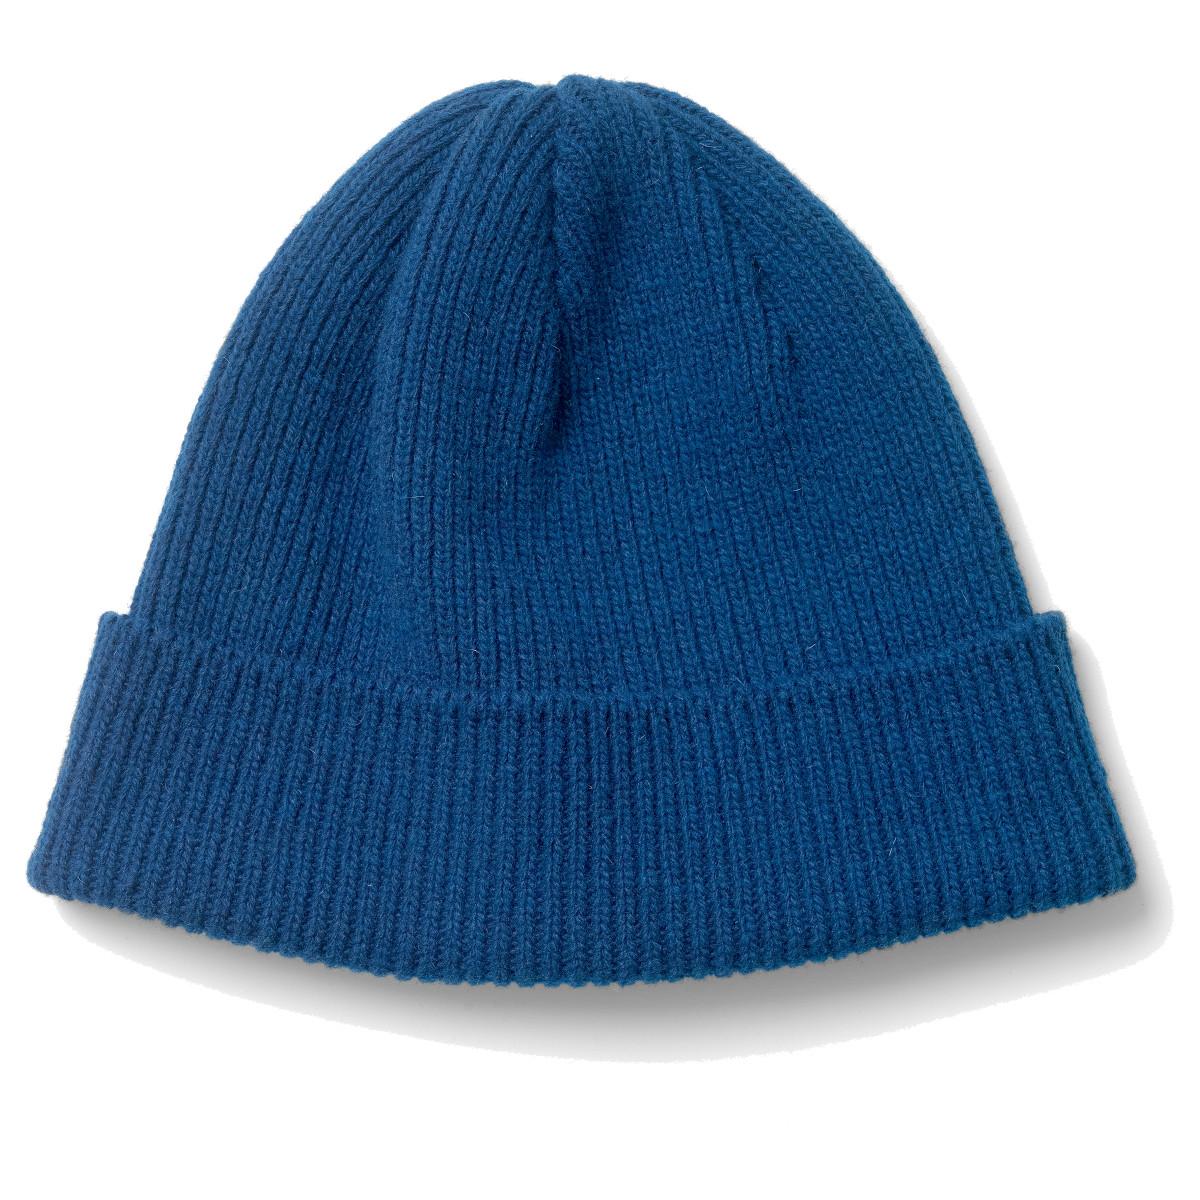 Houdini Hut Hat - Folk Blue